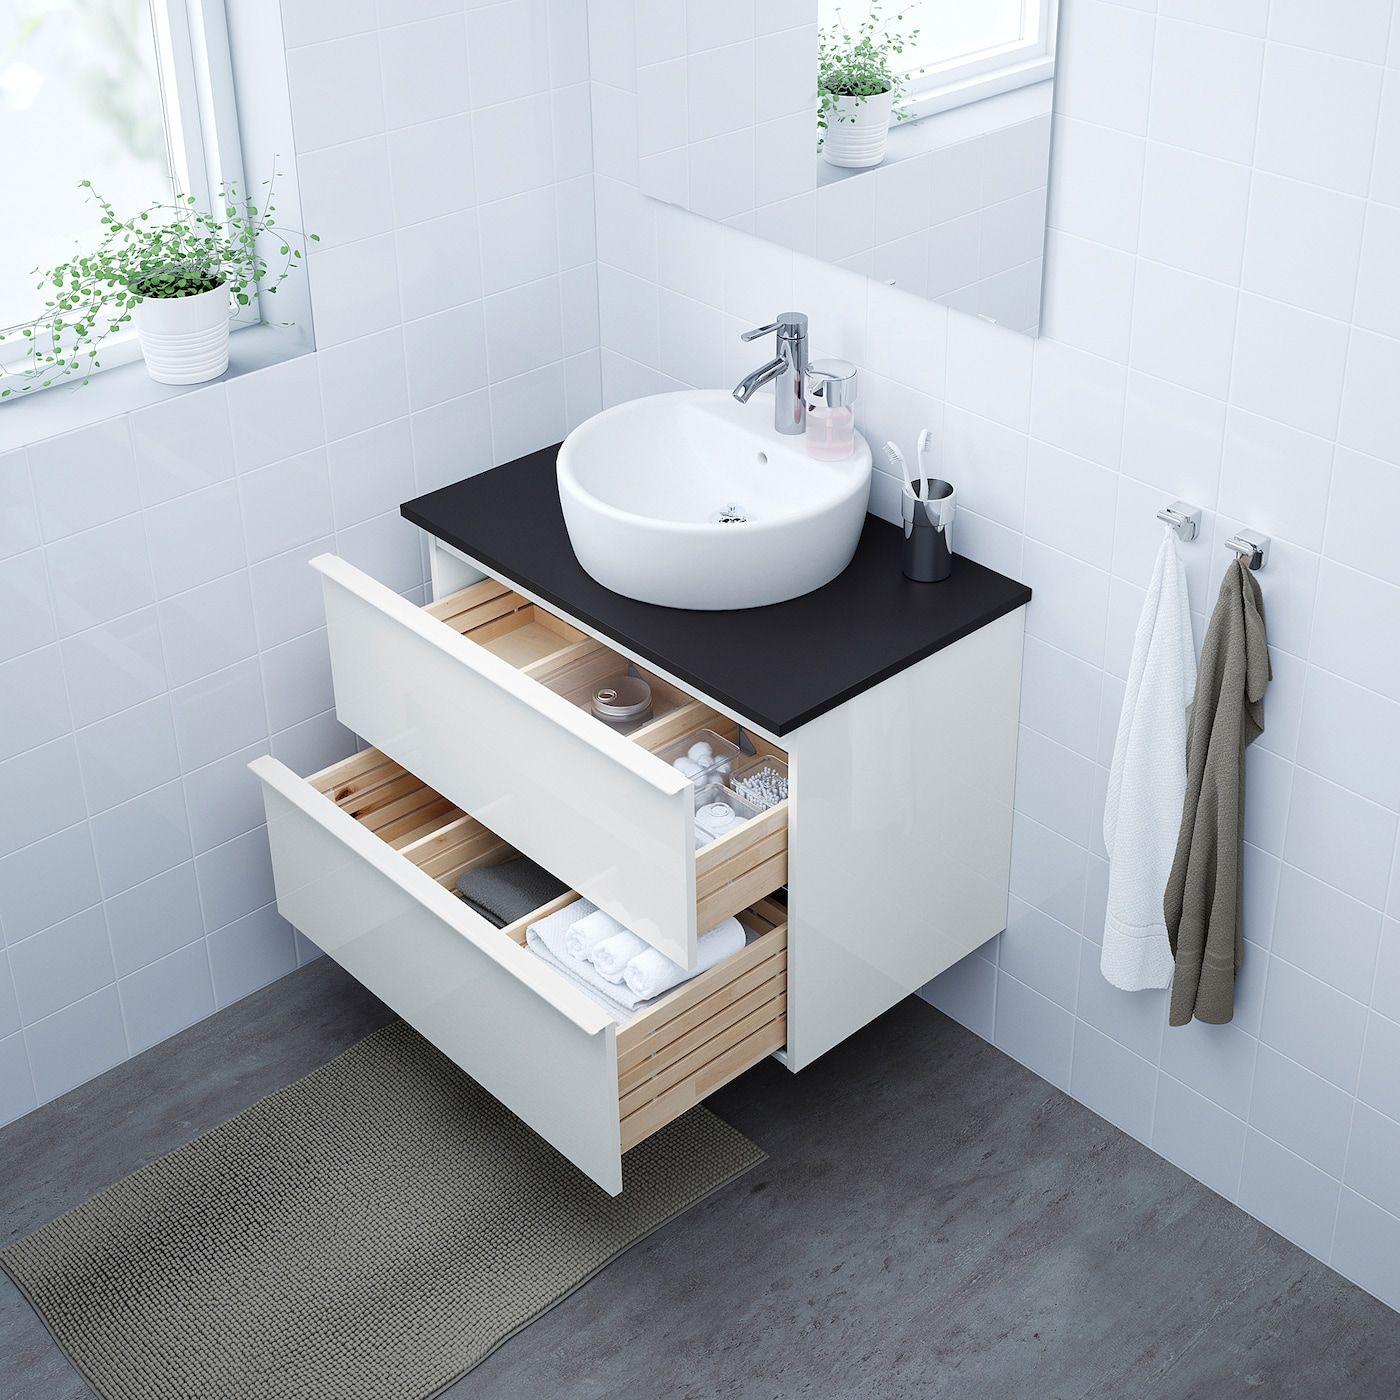 Godmorgon Tolken Tornviken Cabinet Countertop 19 5 8 Sink High Gloss White Anthracite Dalskar Faucet 32 1 4x19 1 4x29 1 8 Ikea In 2020 Ikea Bathroom Bathroom Vanity Tops White Vanity Bathroom